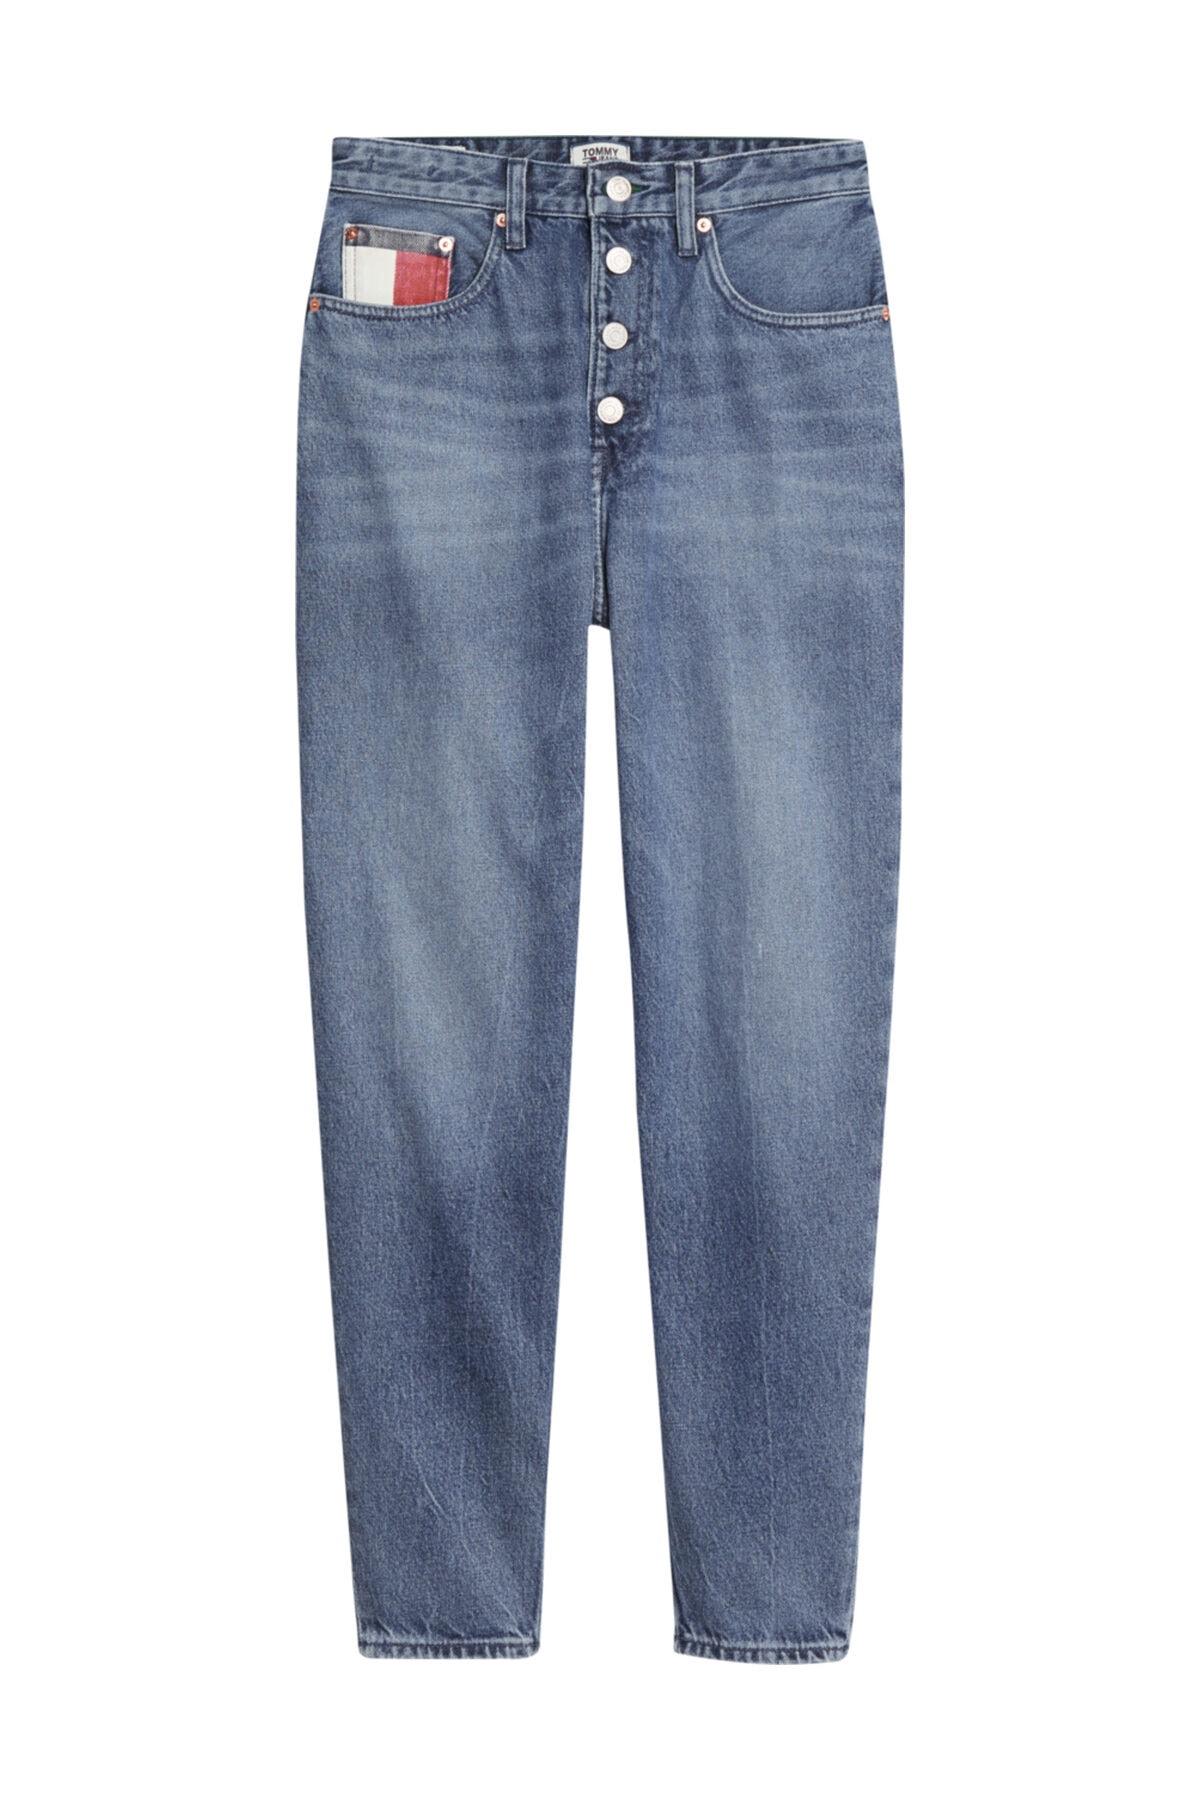 Tommy Hilfiger Kadın Denim Jeans Mom Jean Hr Tprd Btn Fly Svmbr DW0DW08650 1